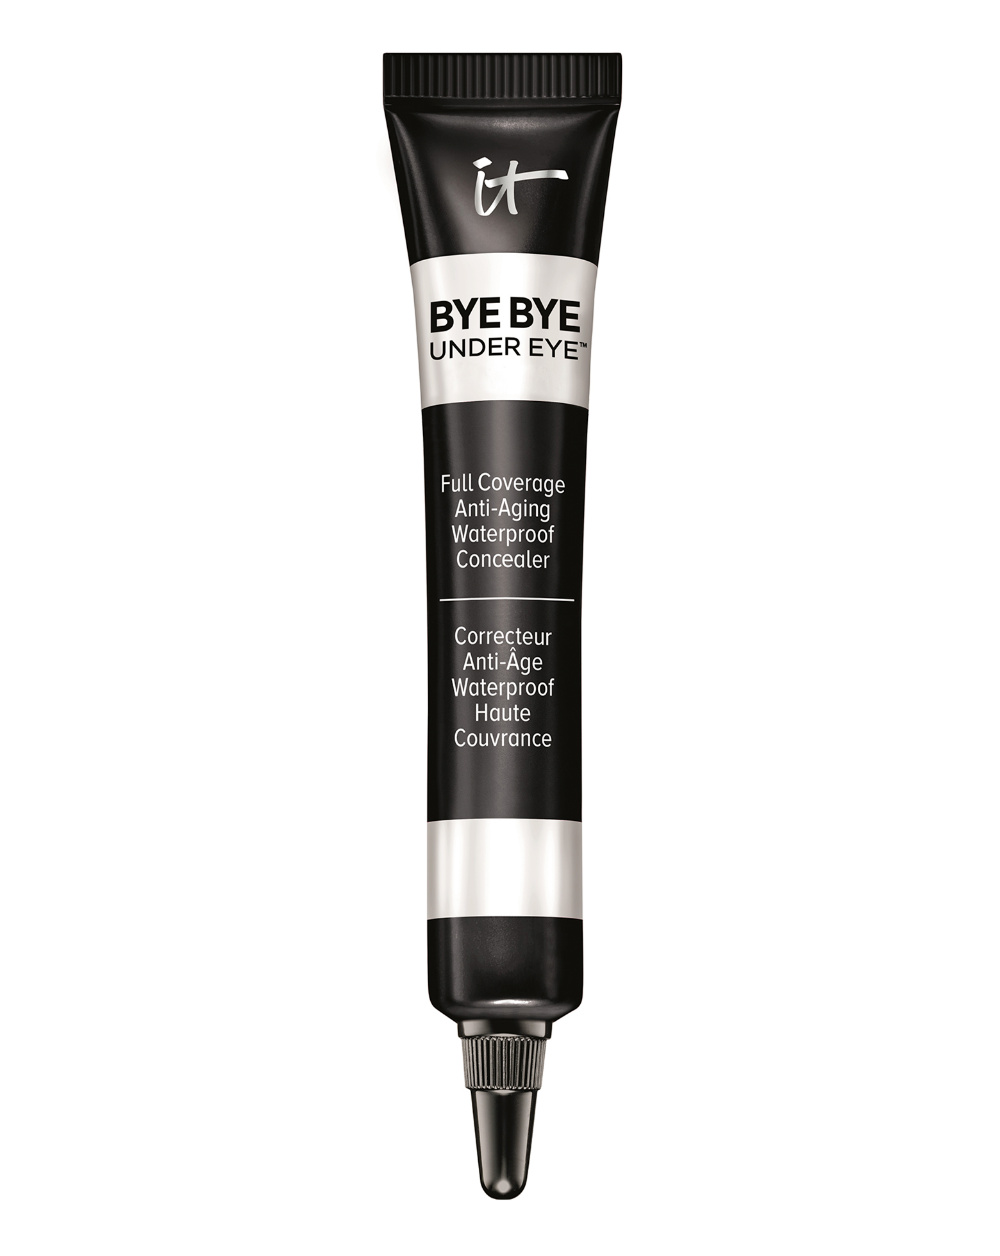 Bye Bye Under Eye Light Fair (N) Under eye concealer